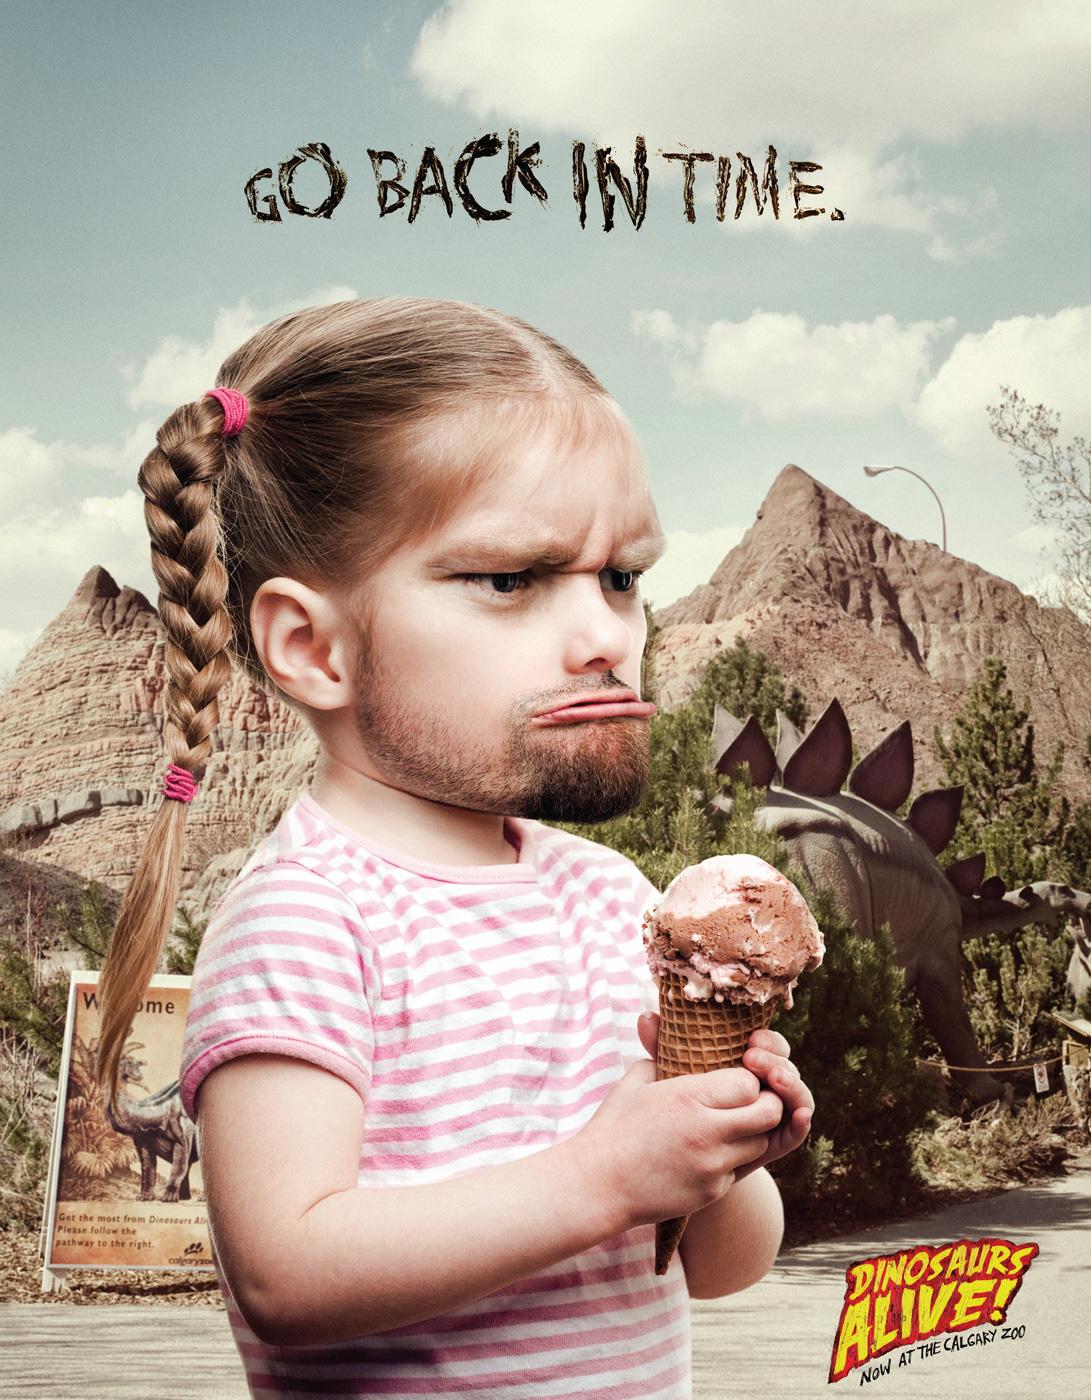 Funny-Print-Ads-09